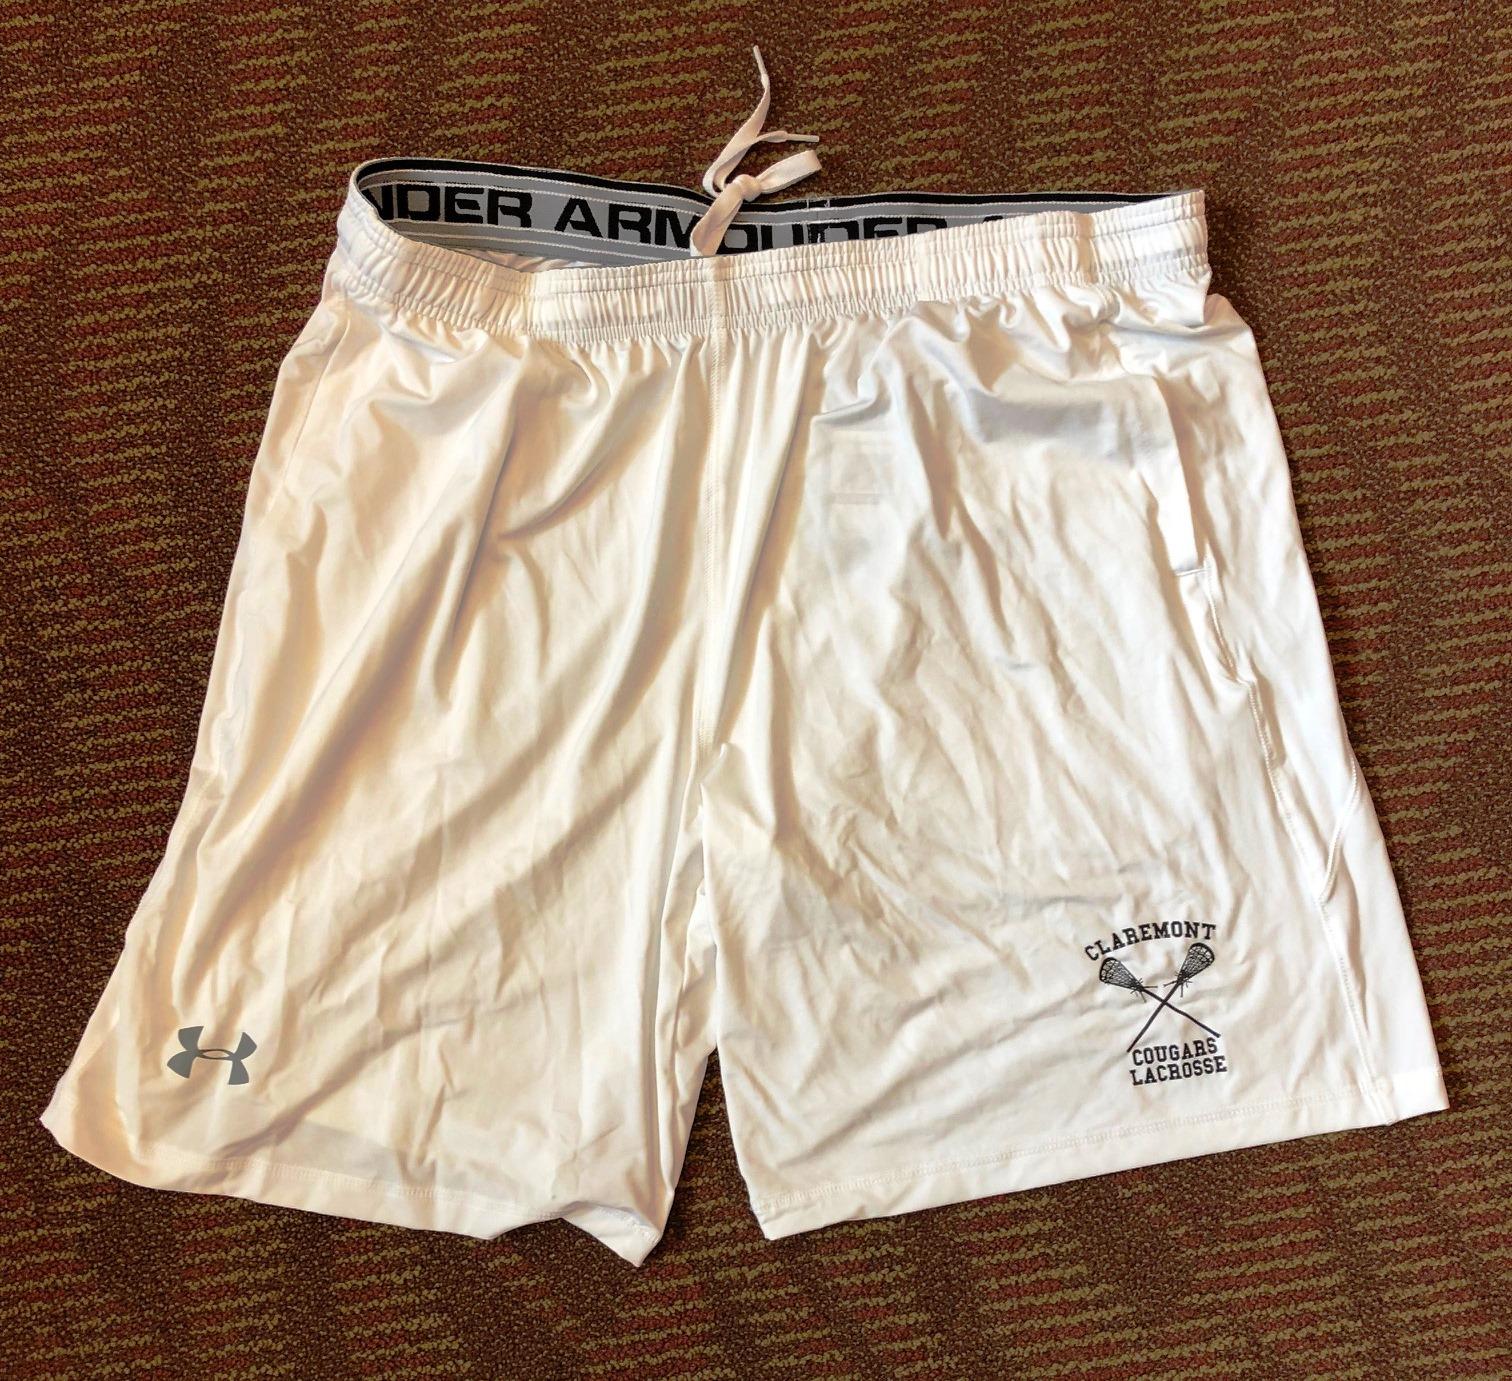 2017 Cougar white shorts